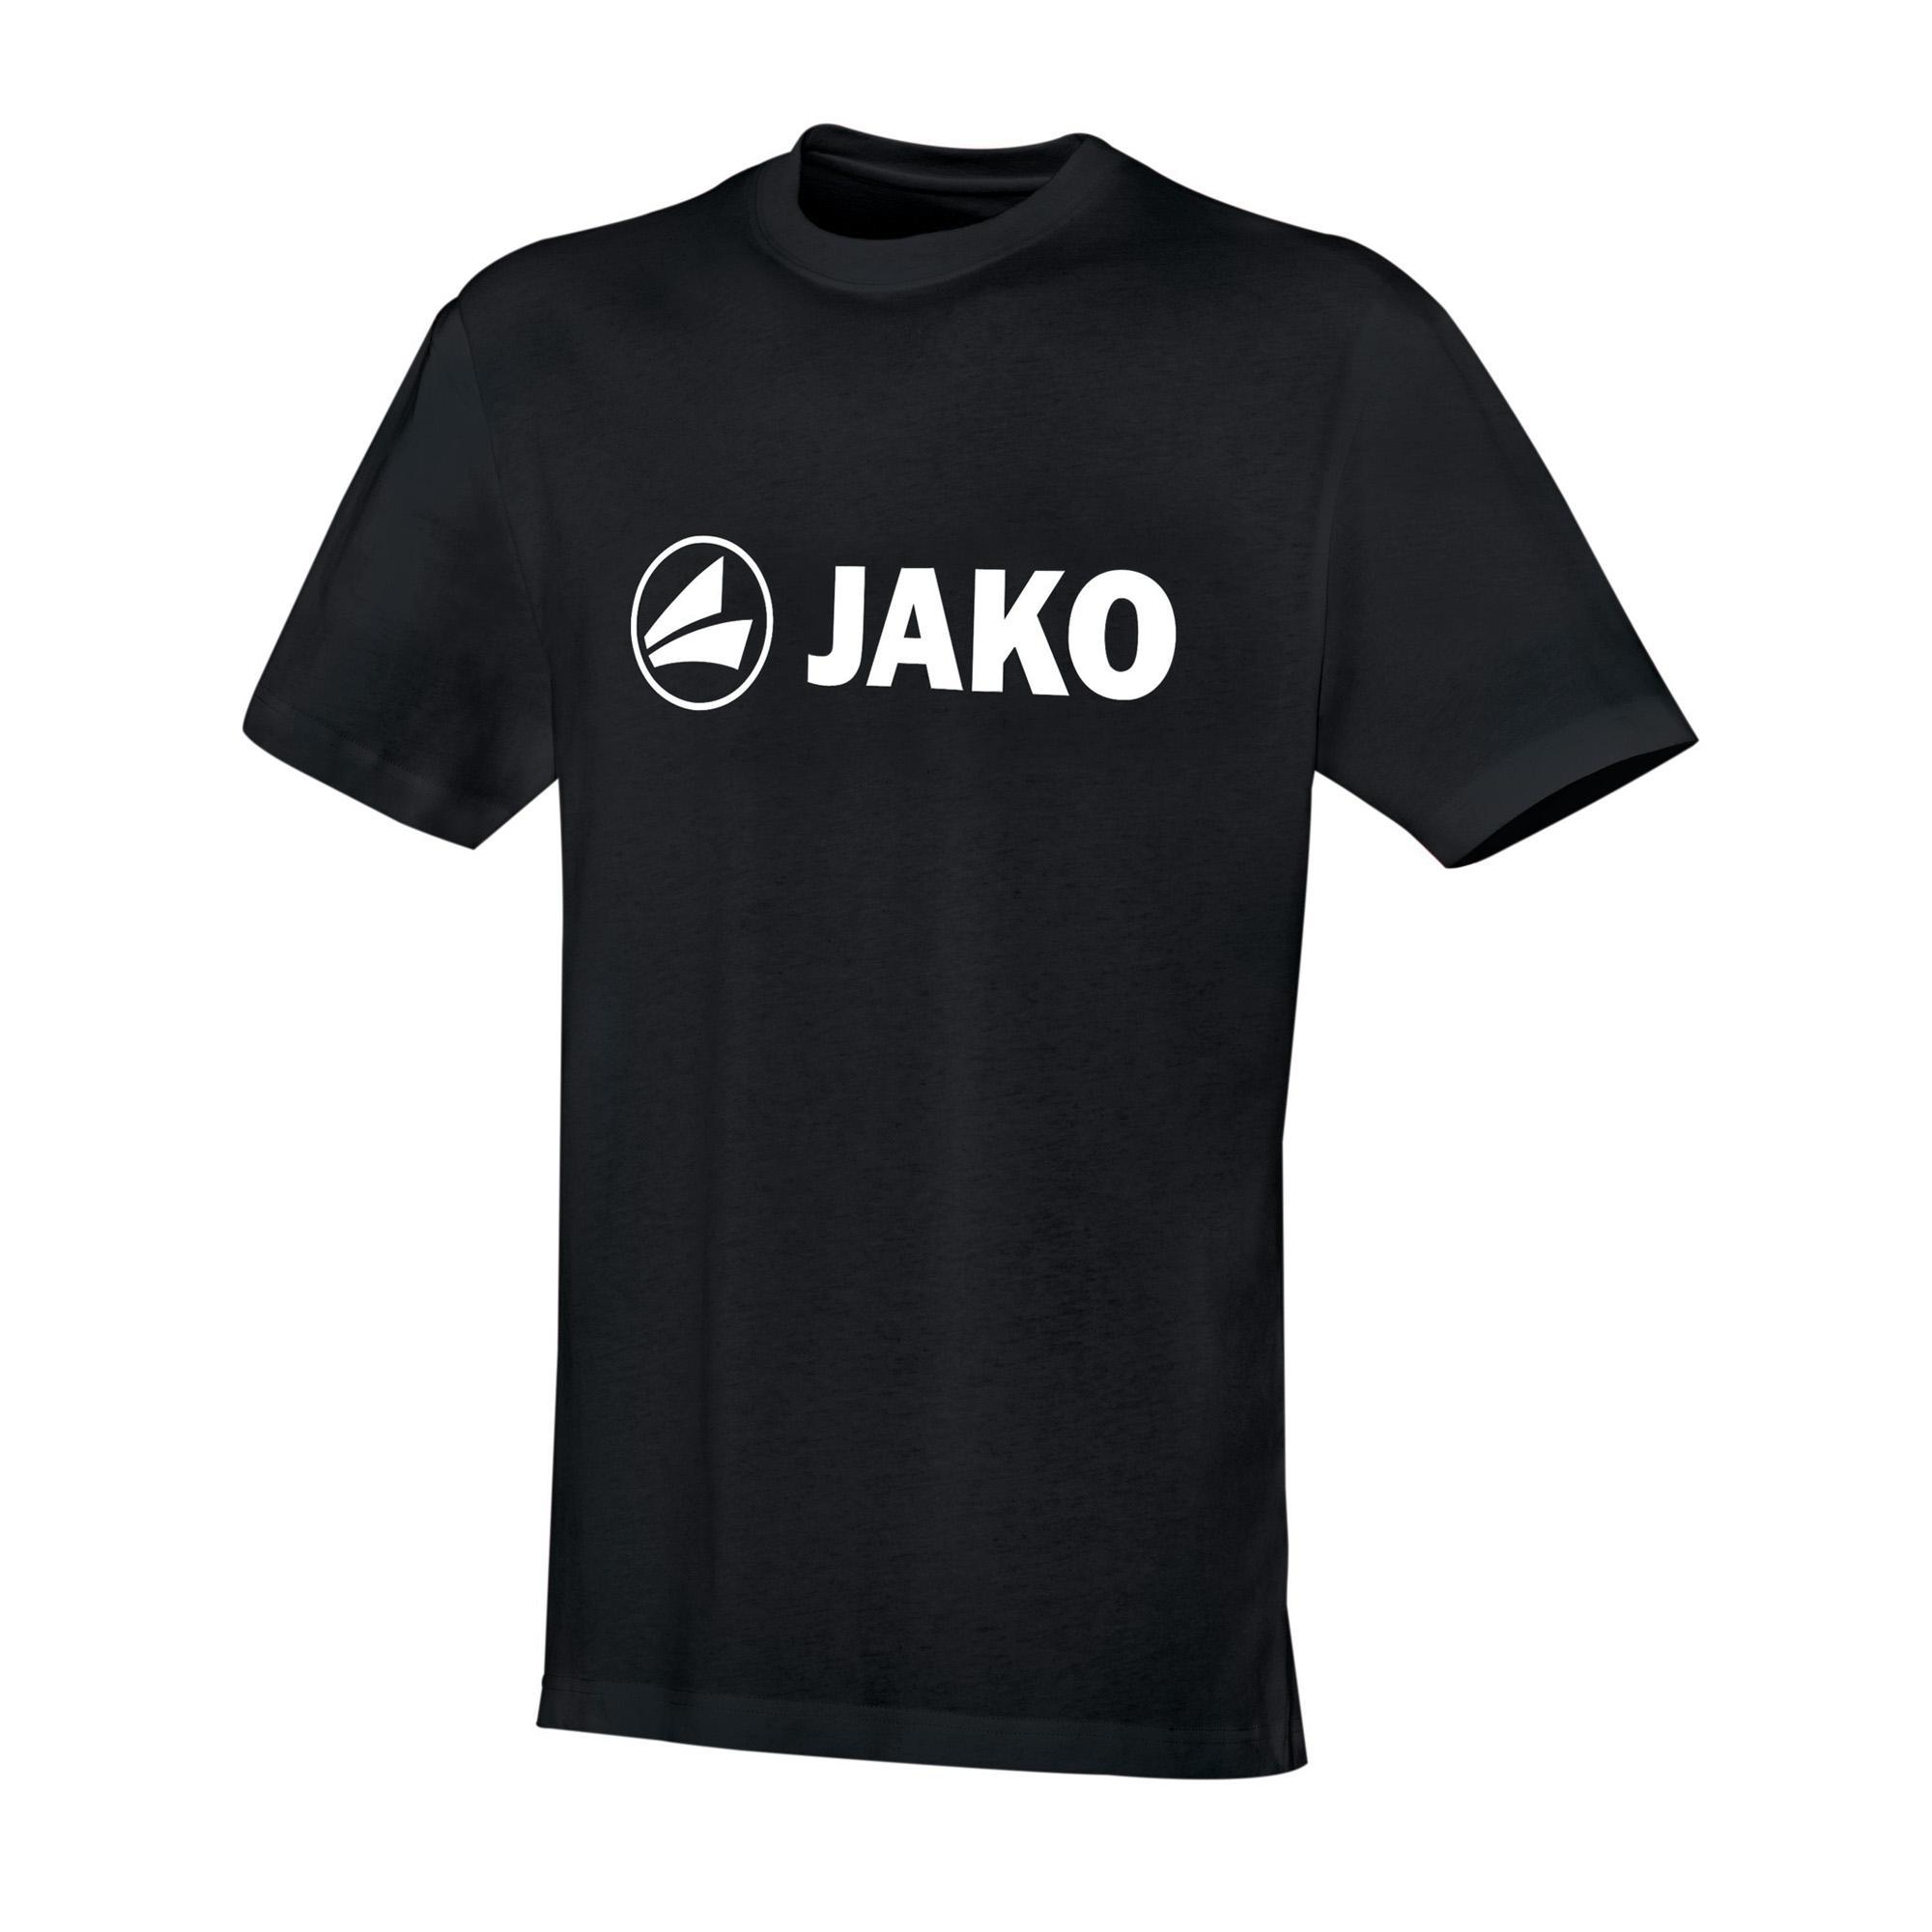 Jako Kinder T-Shirt Promo 6163-08 128